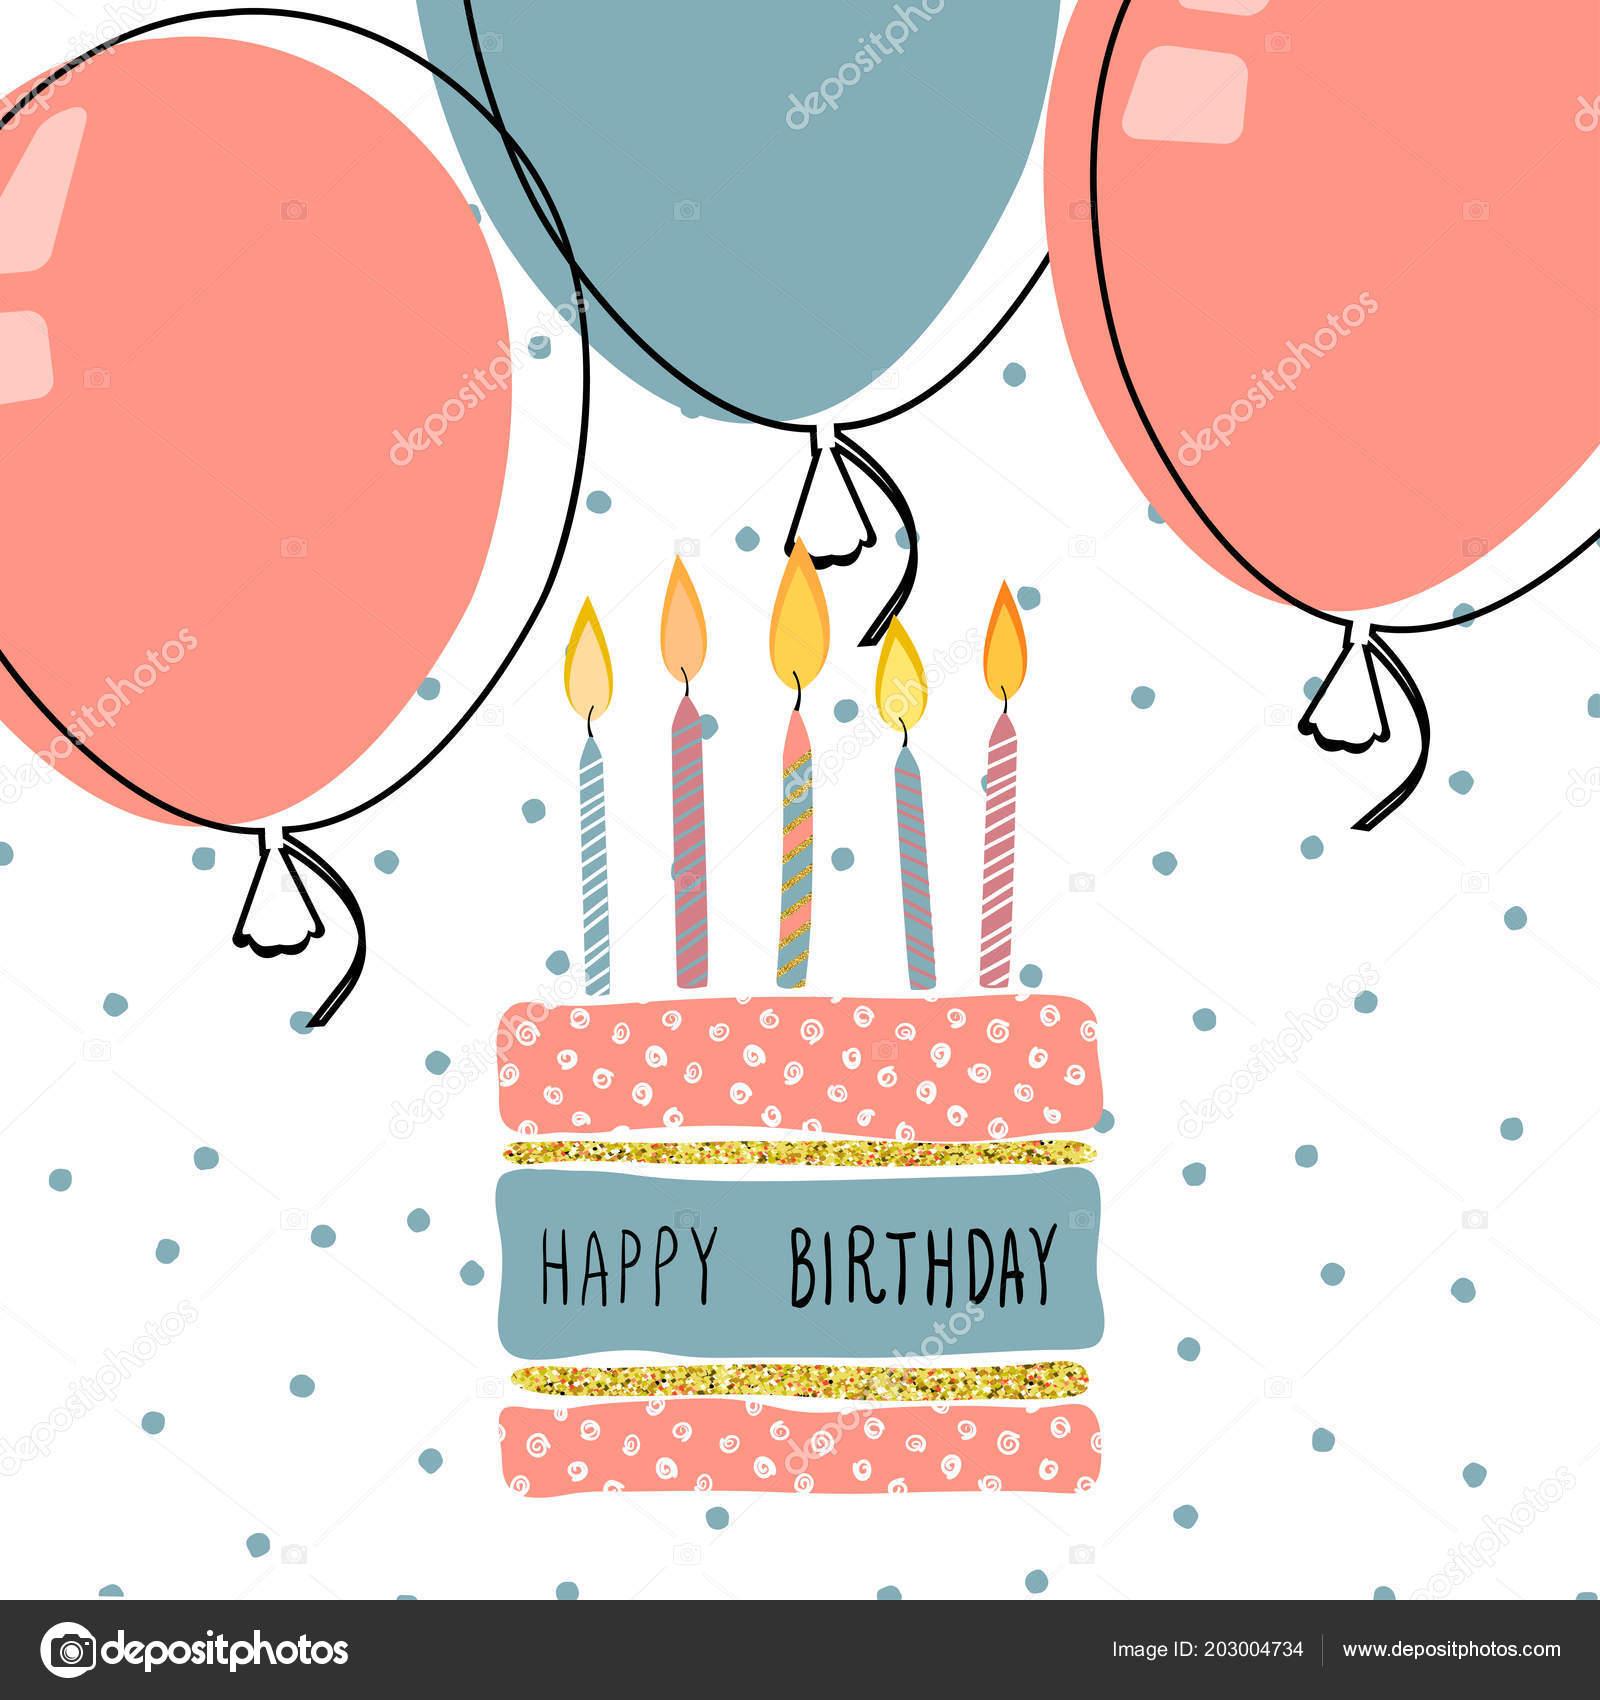 Cute Birthday Greeting Card Handdrawn Background Design Stock